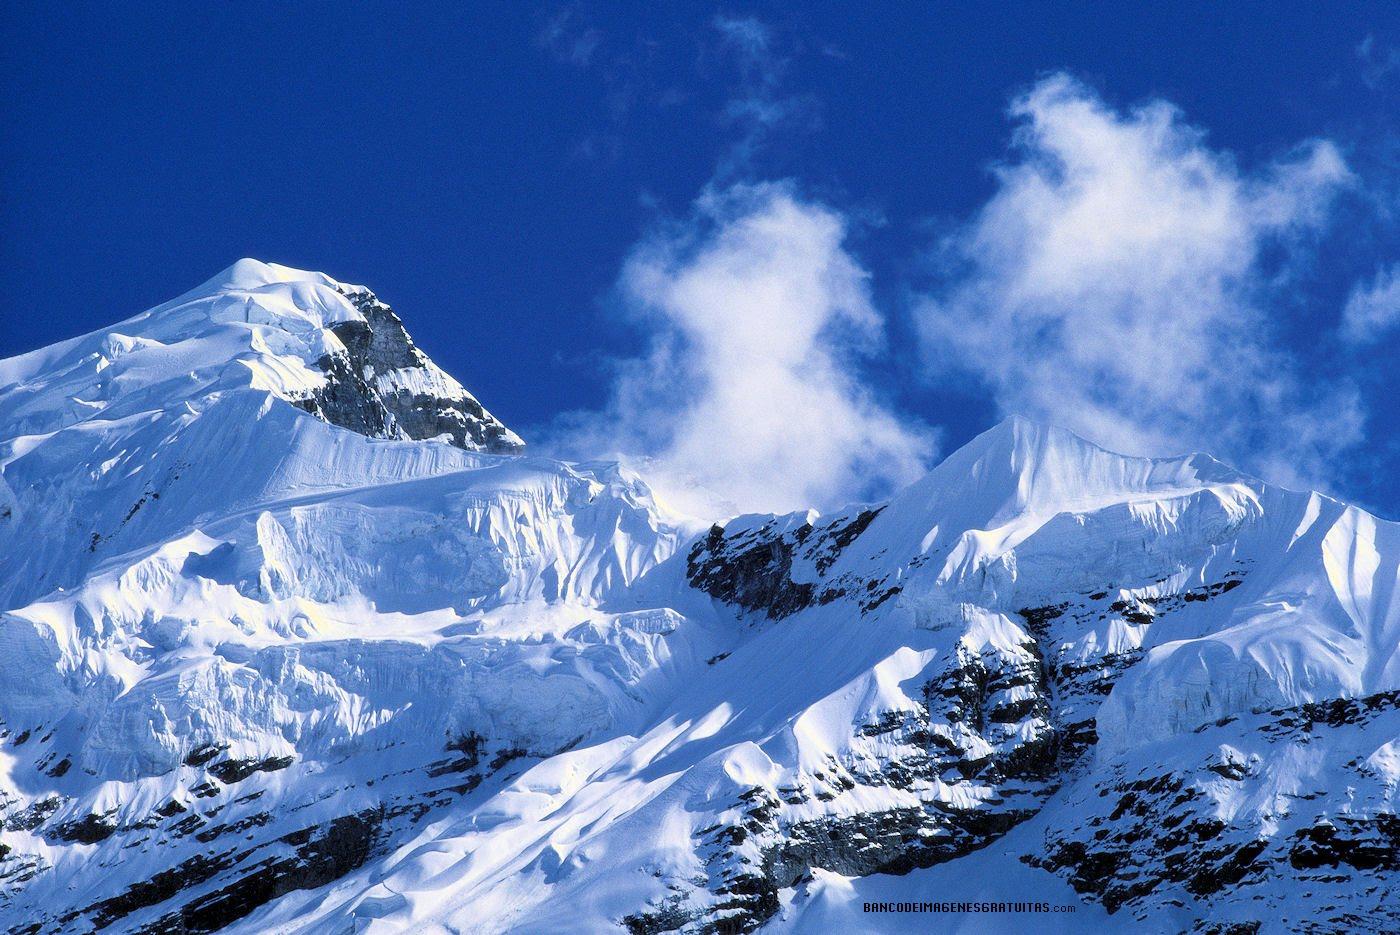 wallpaper de paisajes nevados: